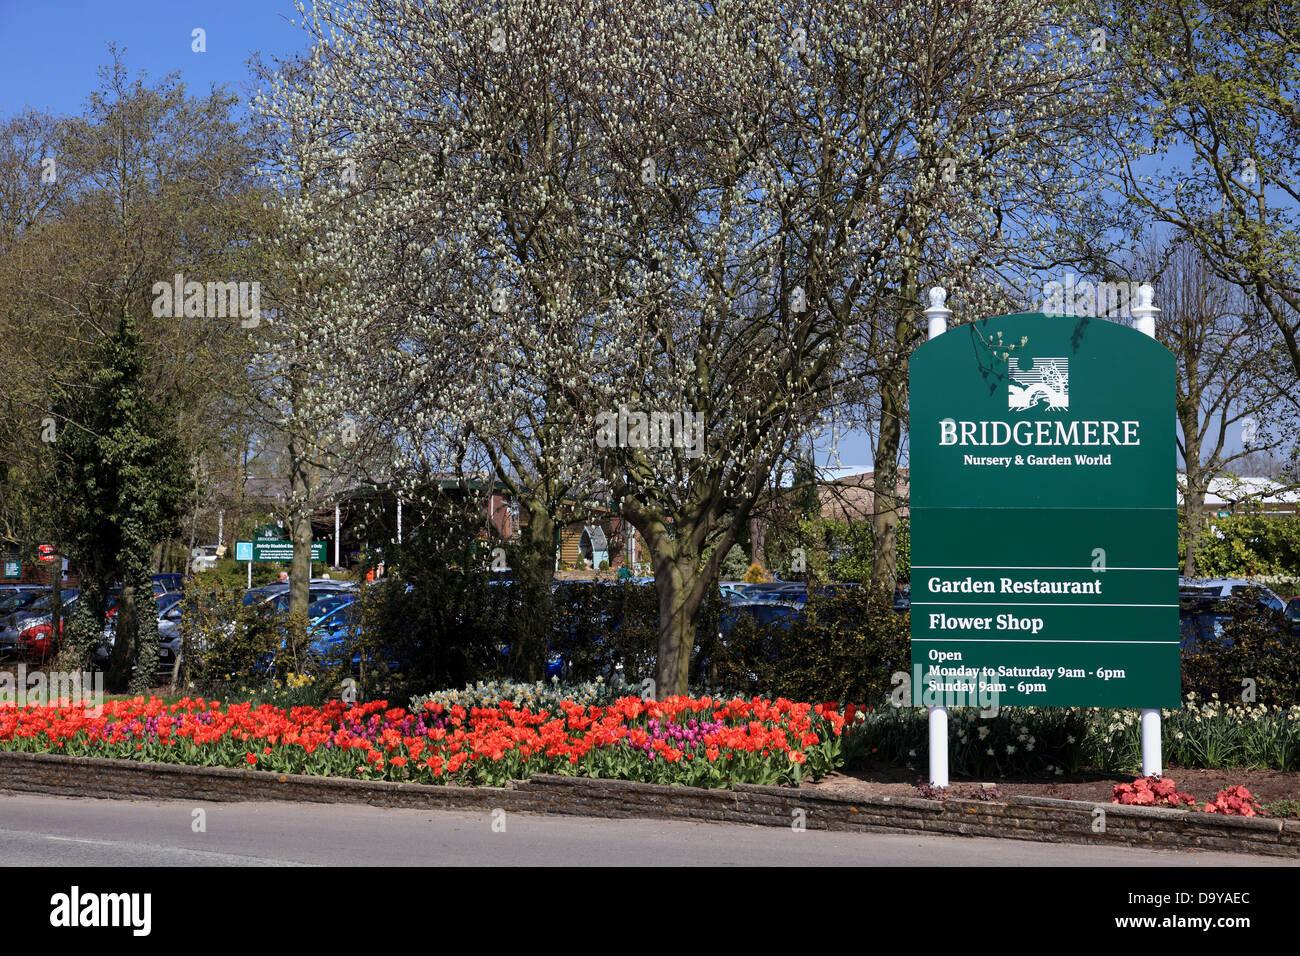 Entrance To Bridgemere Nursery And Garden World Which Is The – Plant World Nursery and Garden Center